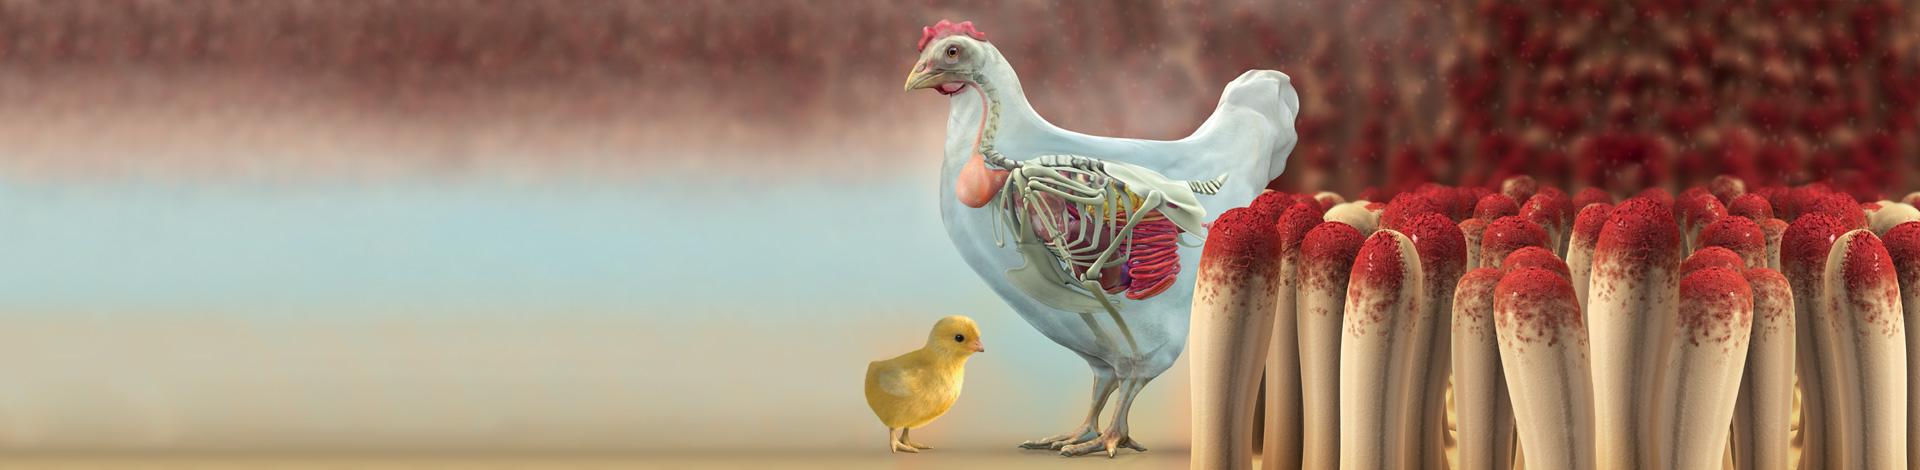 Slider Poultry Producers